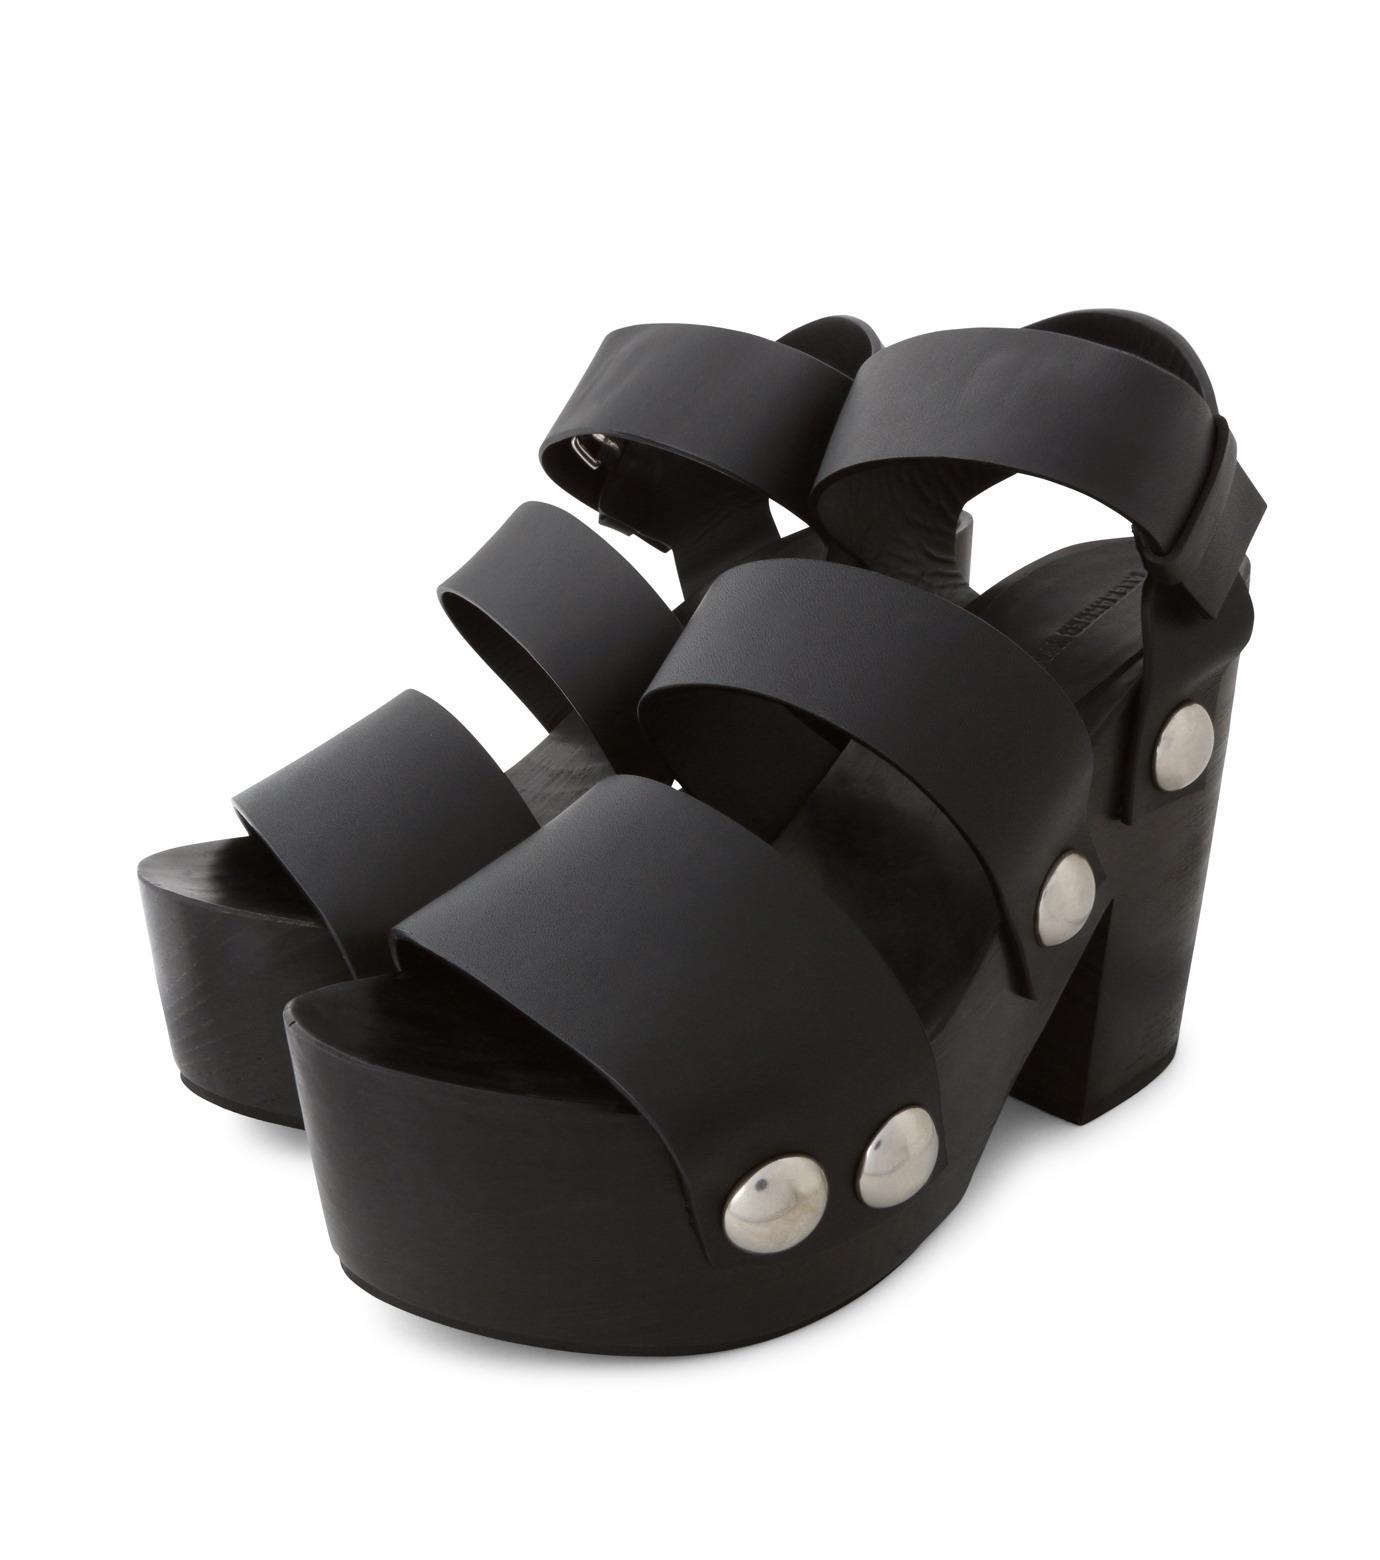 Alexander Wang(アレキサンダーワン)のTess Wooden Platform Sandal-BLACK(シューズ/shoes)-304132P16-13 拡大詳細画像3